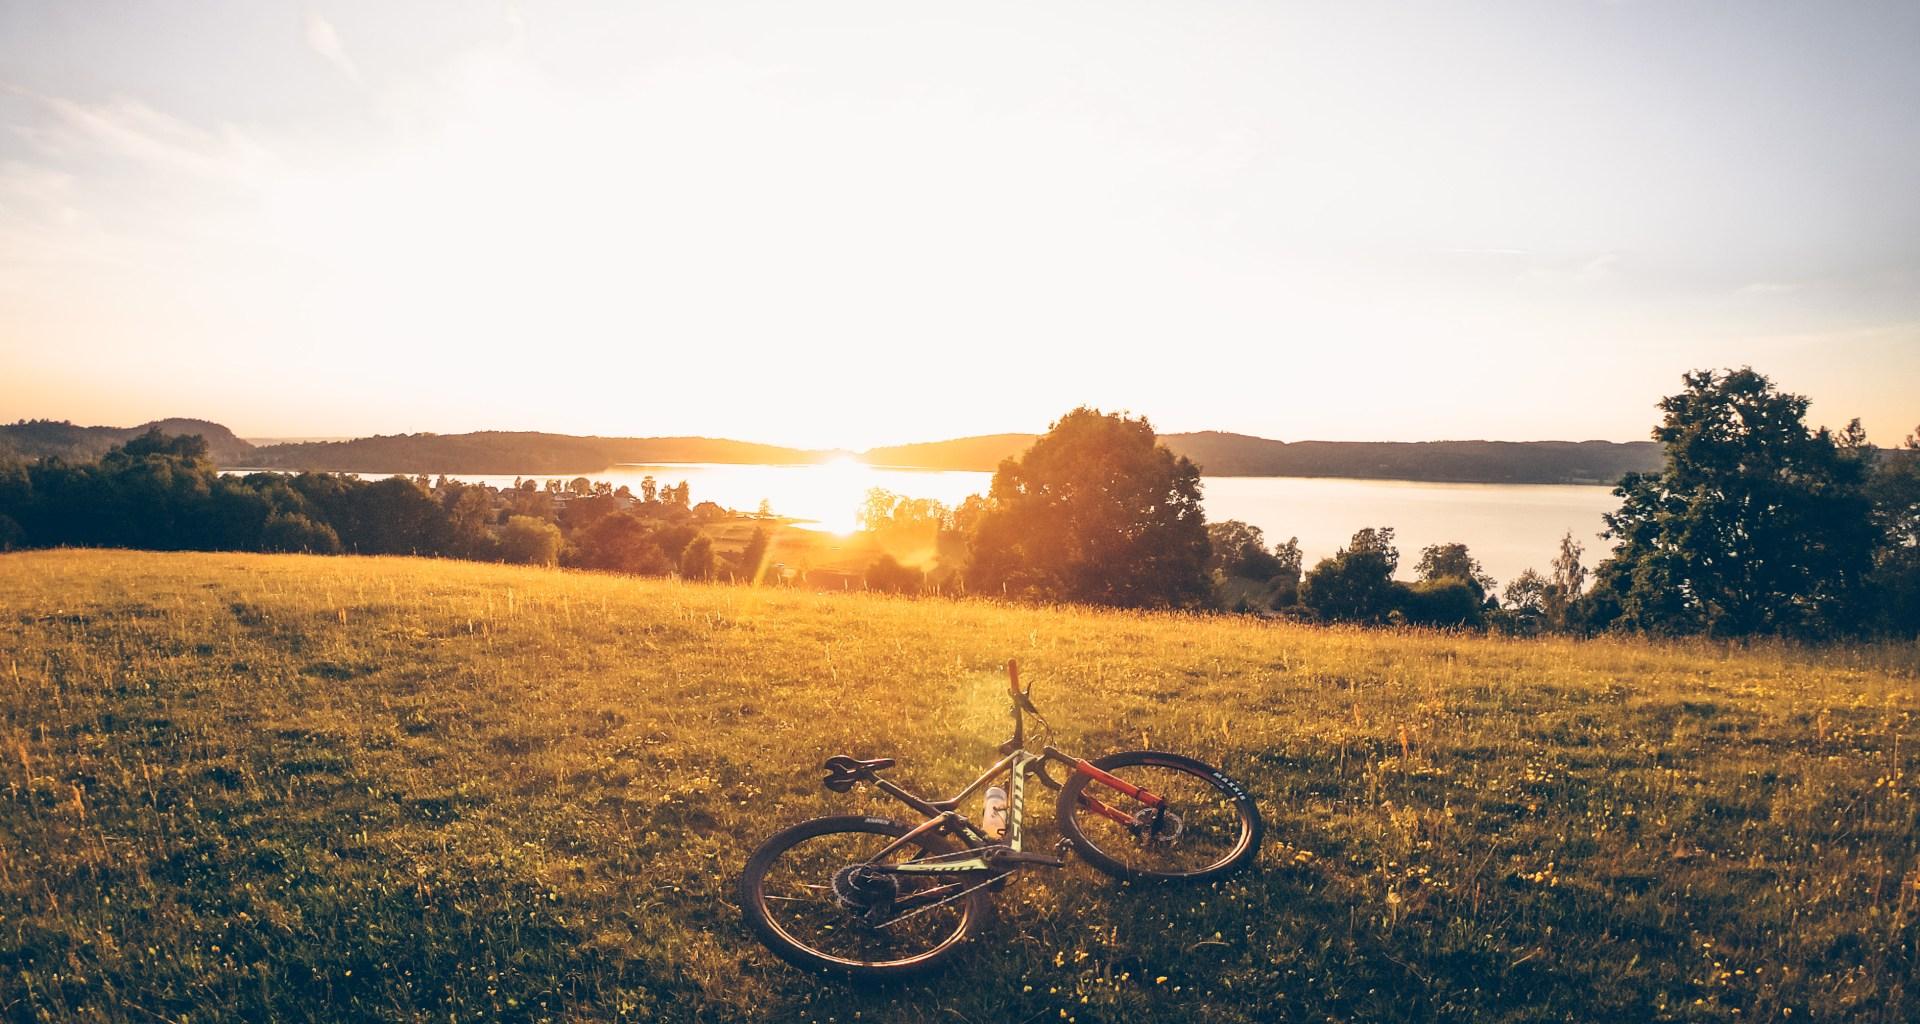 Cykelpodd